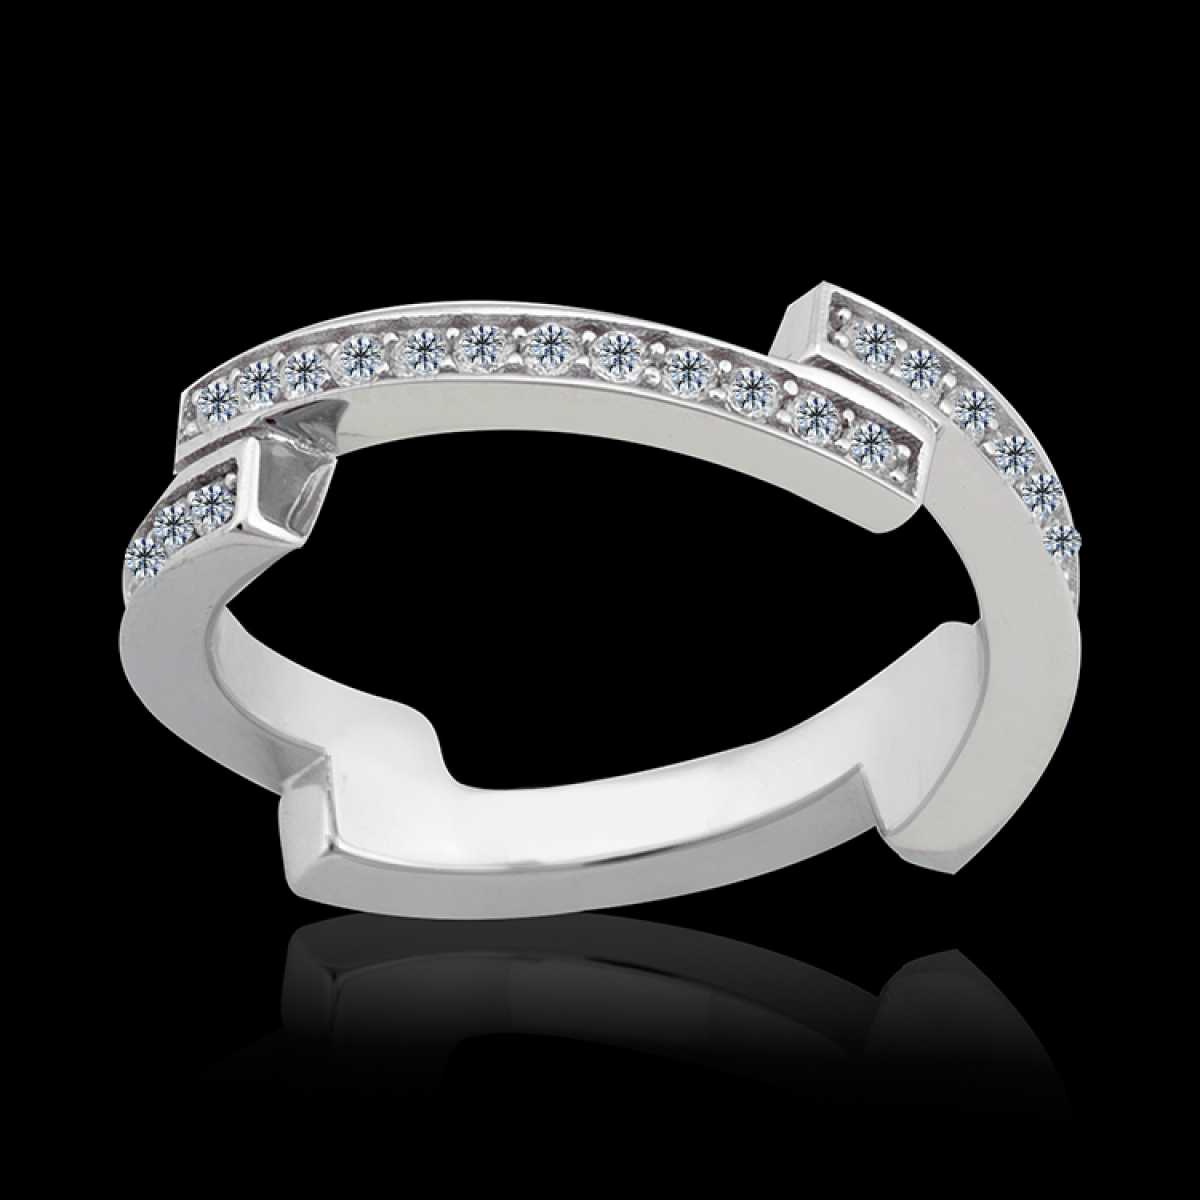 Classy Design Silver Ring